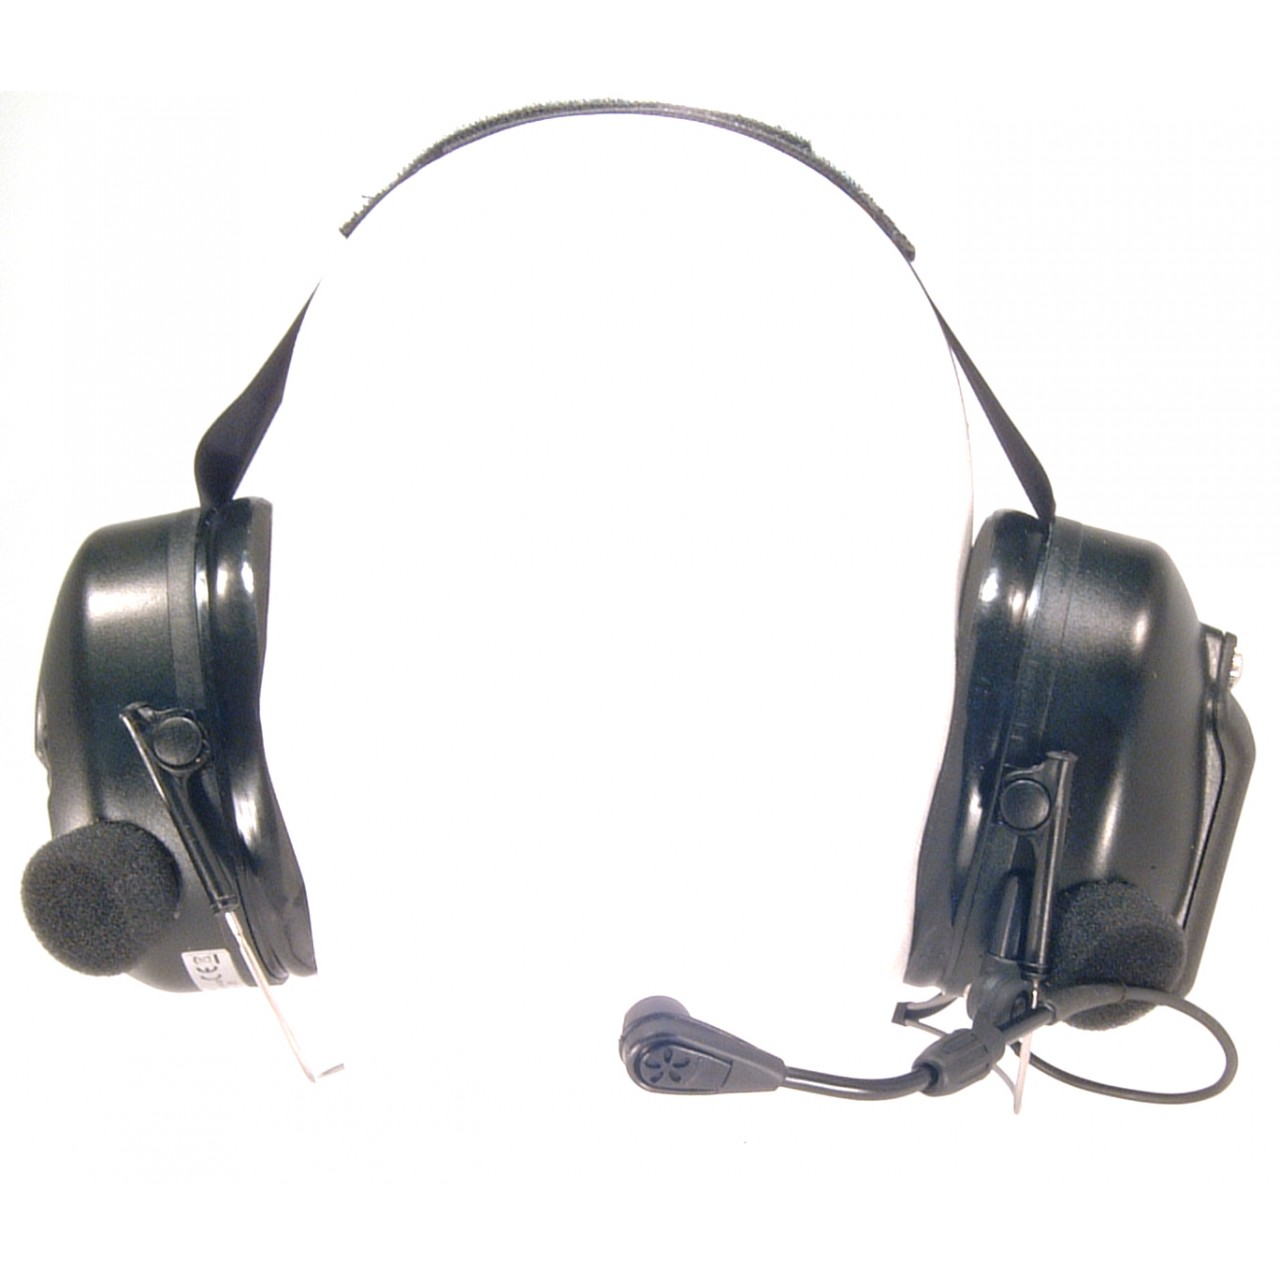 HS-PEACSN Headsets and earphones - ICOM